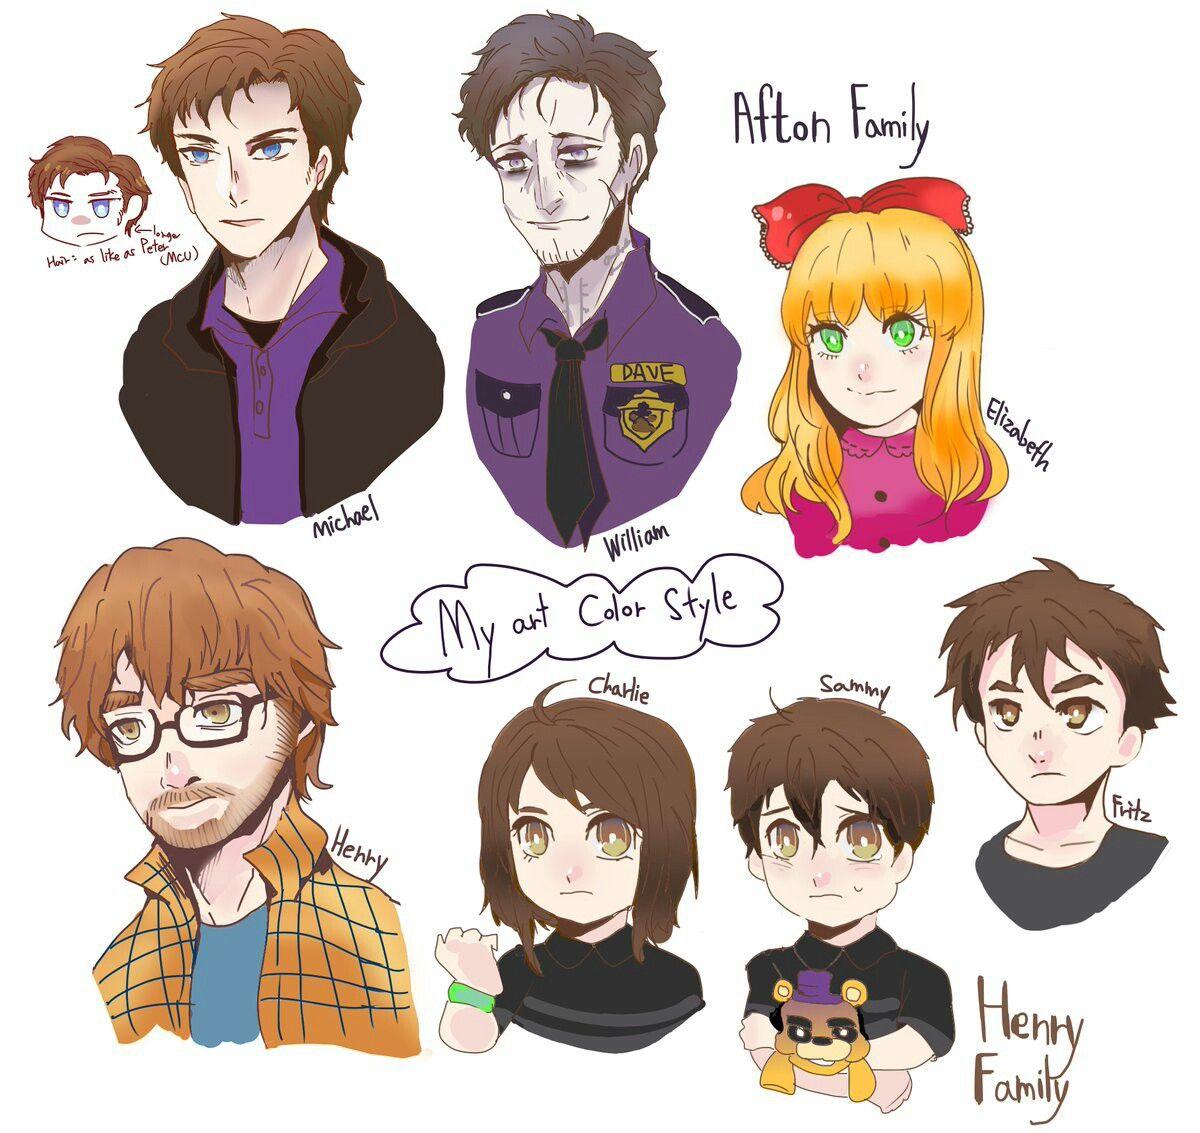 Pin By Yuna Wolf On Myla Anime Fnaf Fnaf Drawings Fnaf Comics